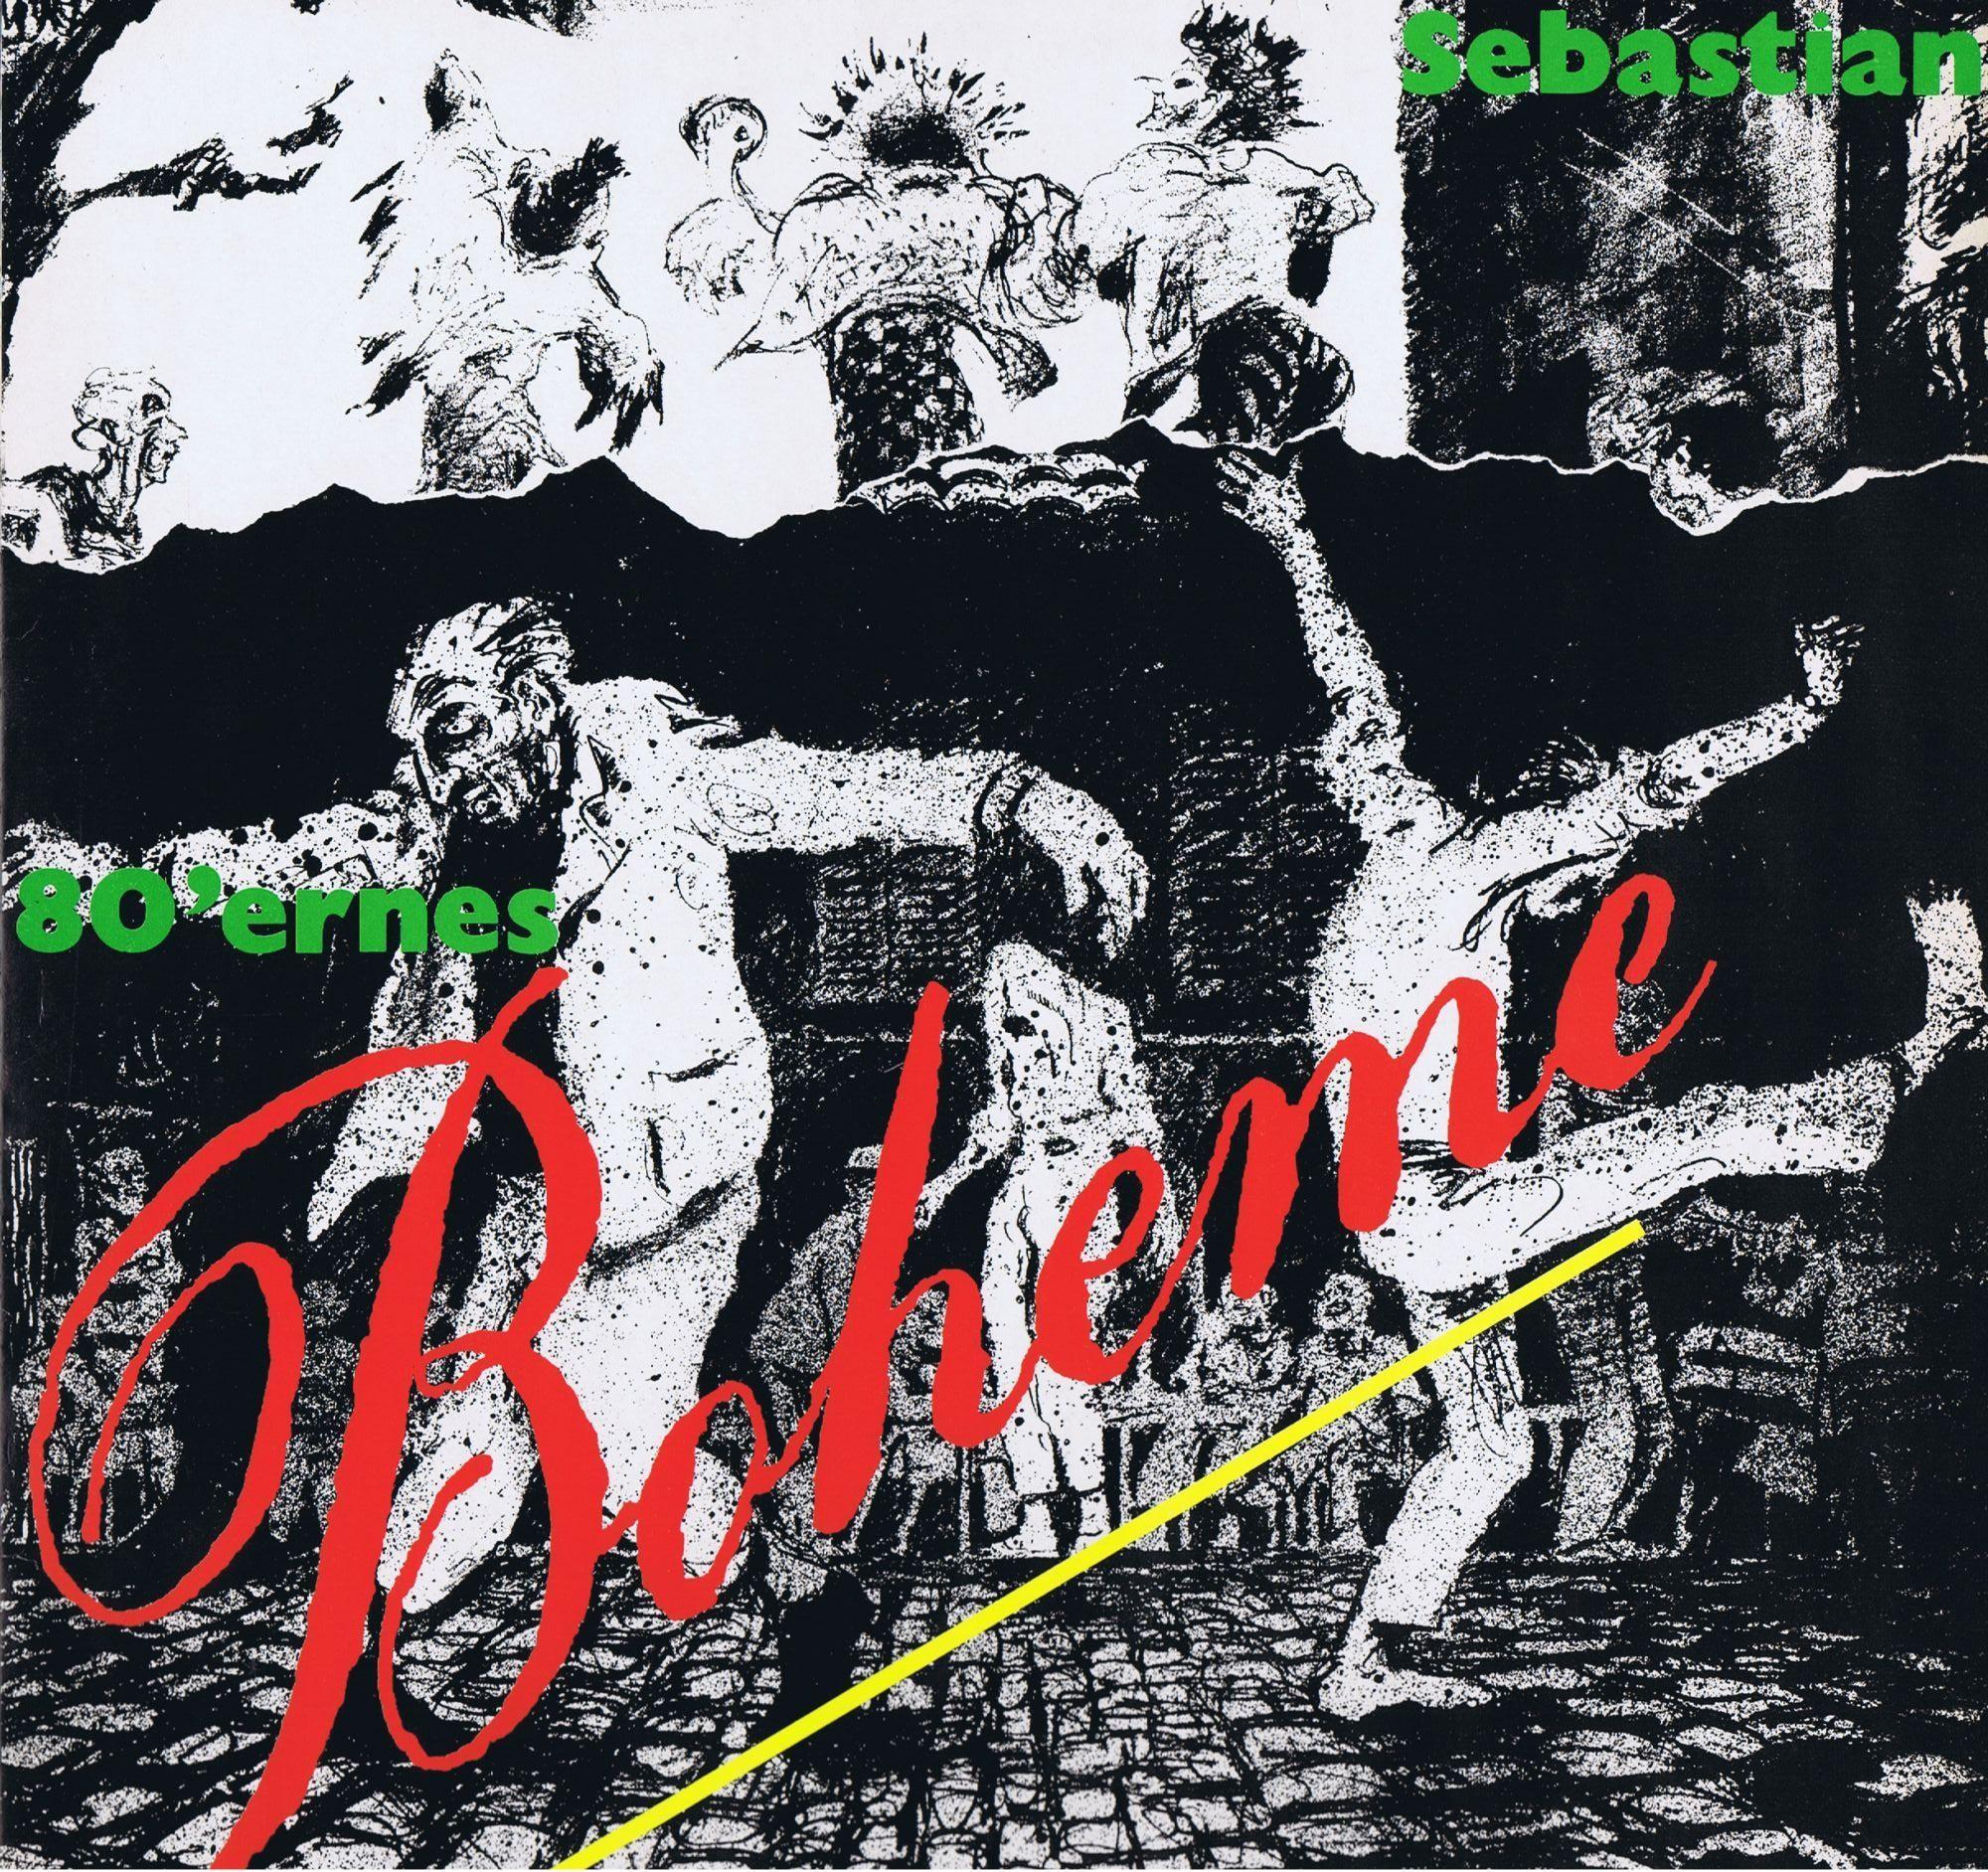 80'ernes Boheme - Sebastian - Musik -  - 7332181092684 - 29/11-2019